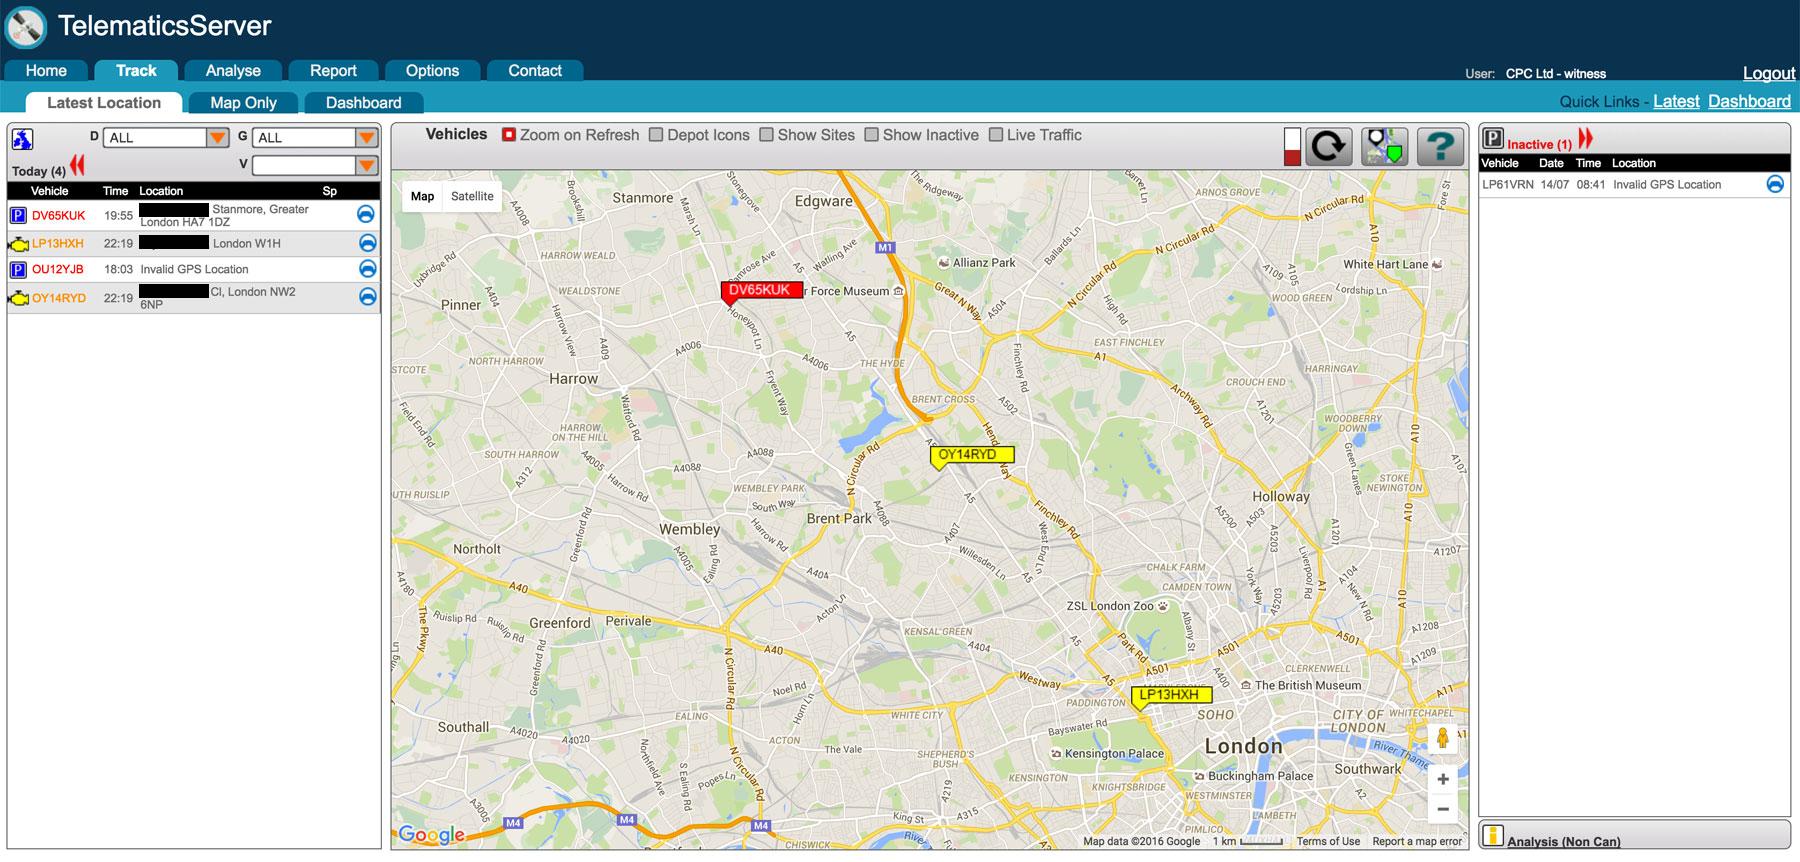 Fleet Dash Cams - Tracking Map Screen